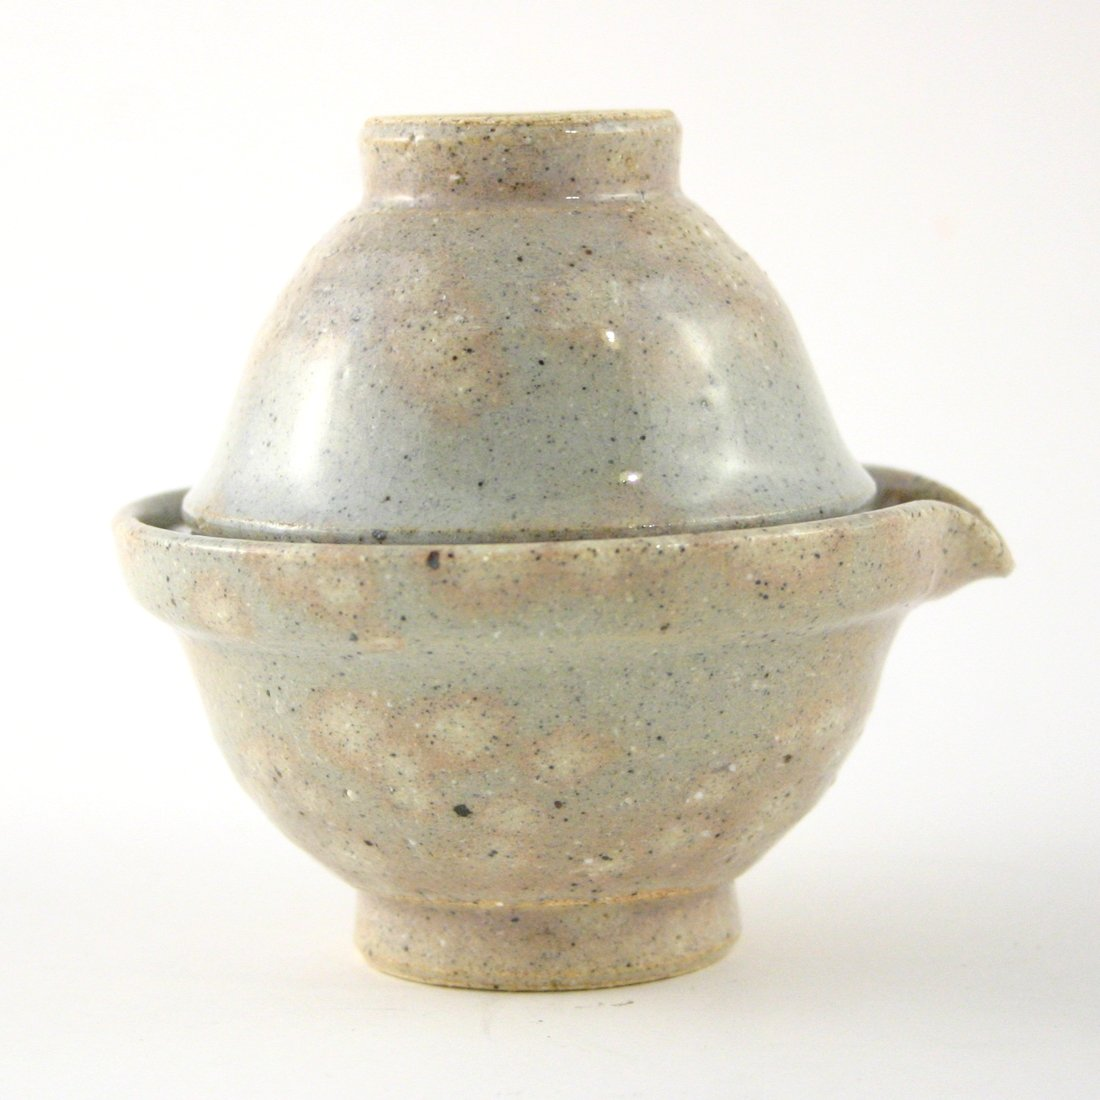 Traditional Tea for One / Korea / Momiji / Hand-made / Travel Teaset